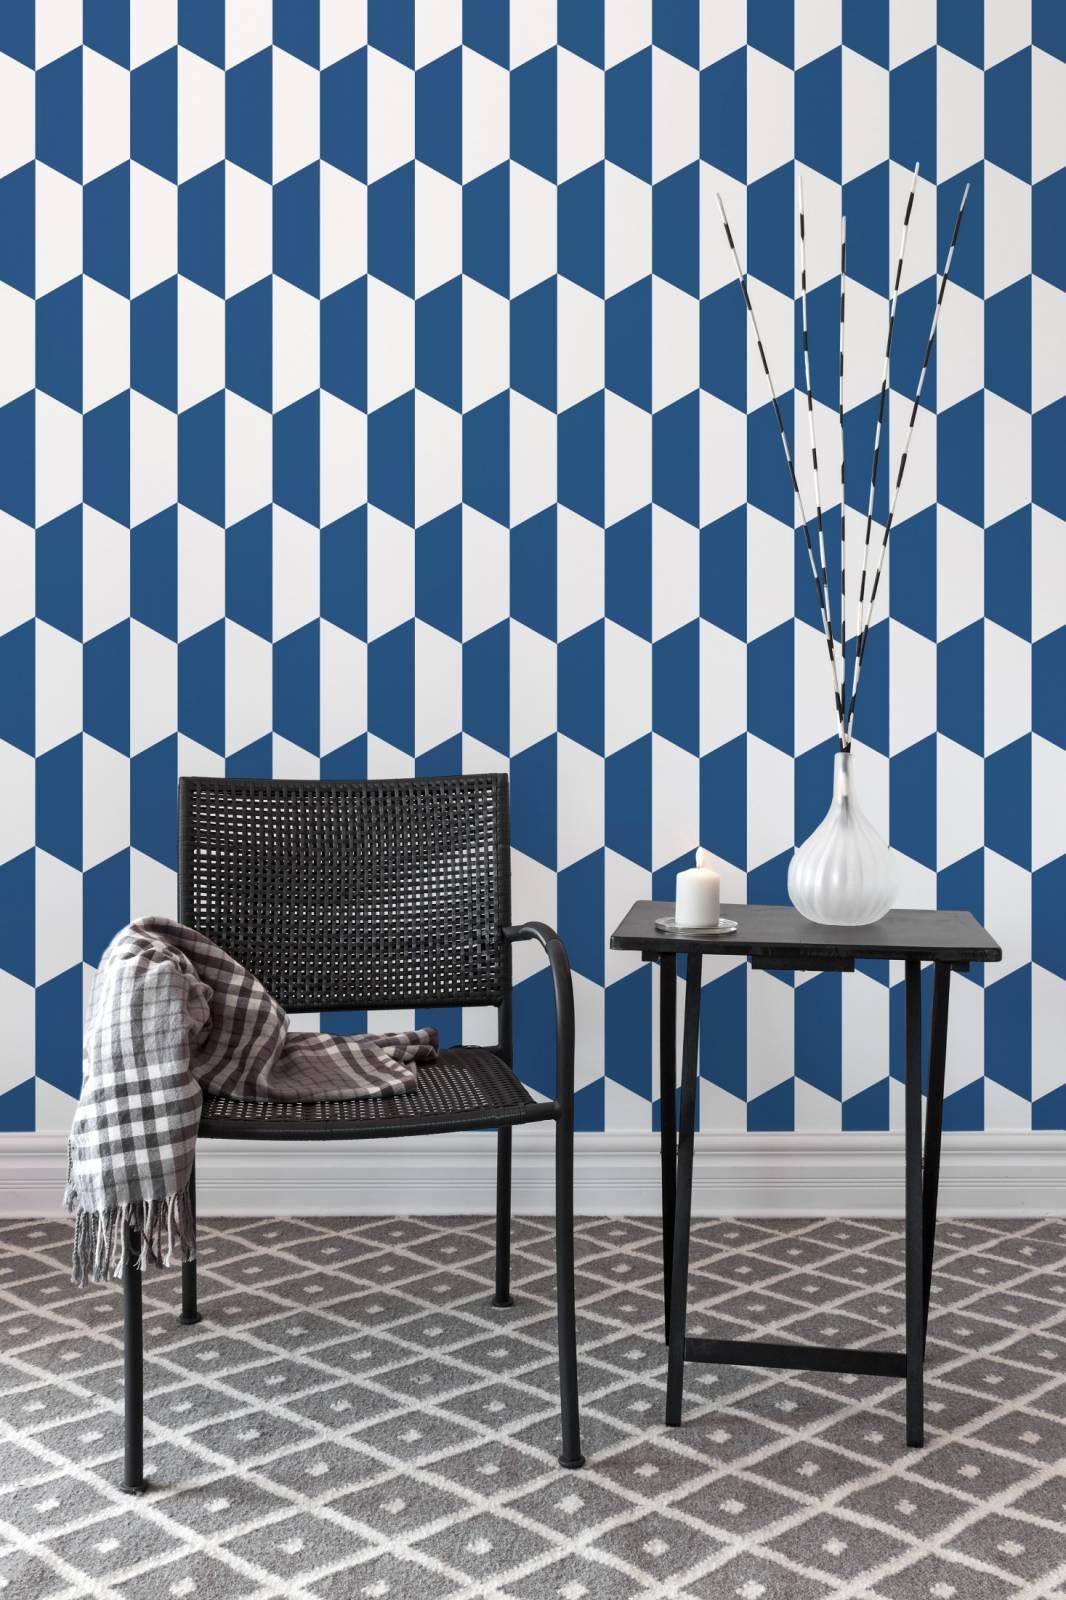 Papel de Parede Azul e Branco | Adesivo Vinilico imagem 3